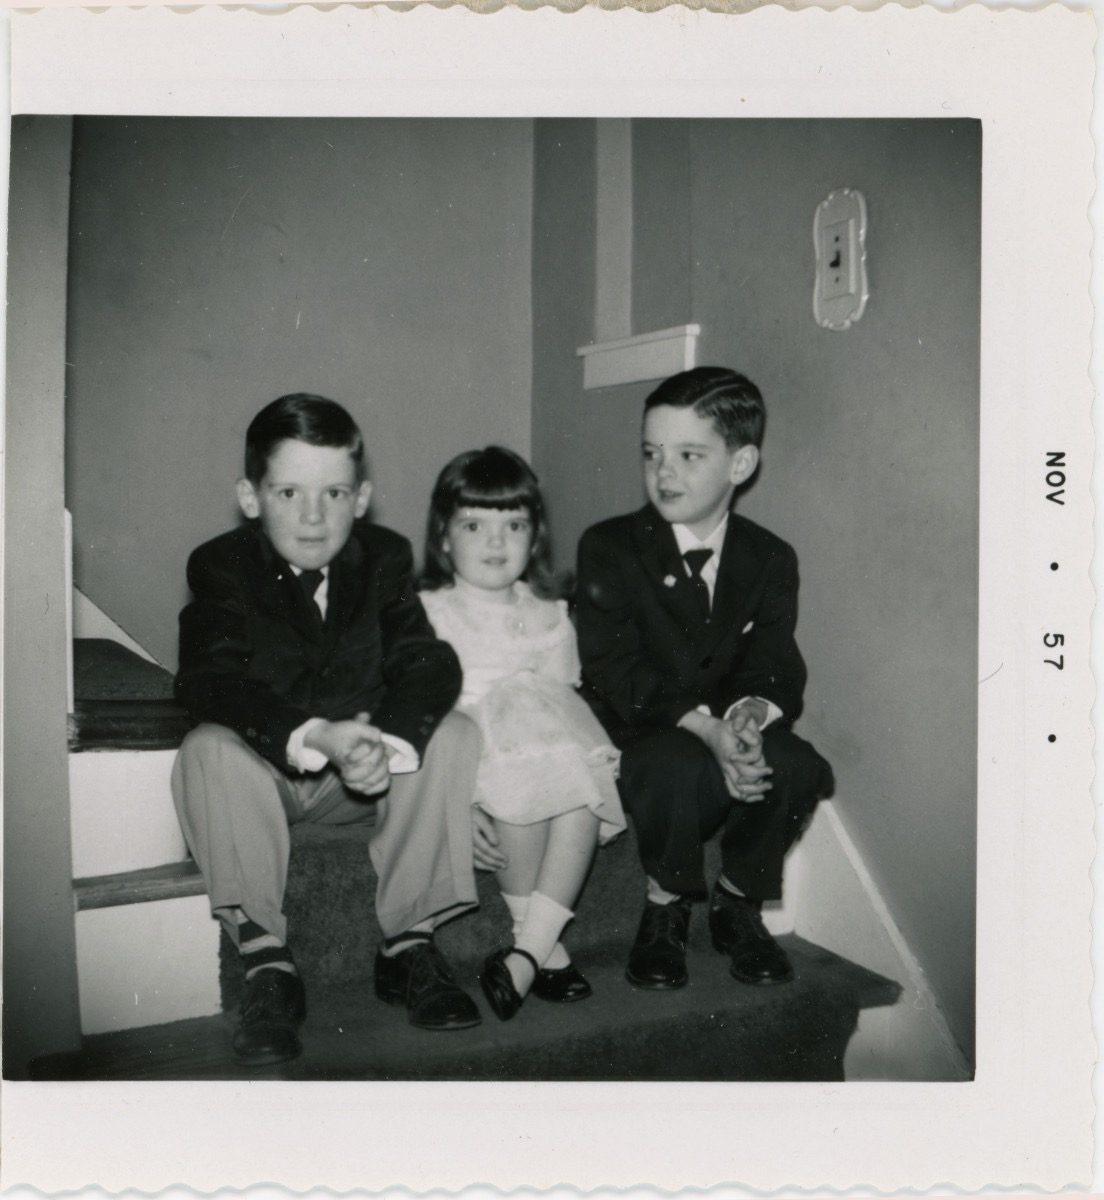 McDermott Family album / Washington DC :: Alice and her two brothers, Elmont, New York, 1957